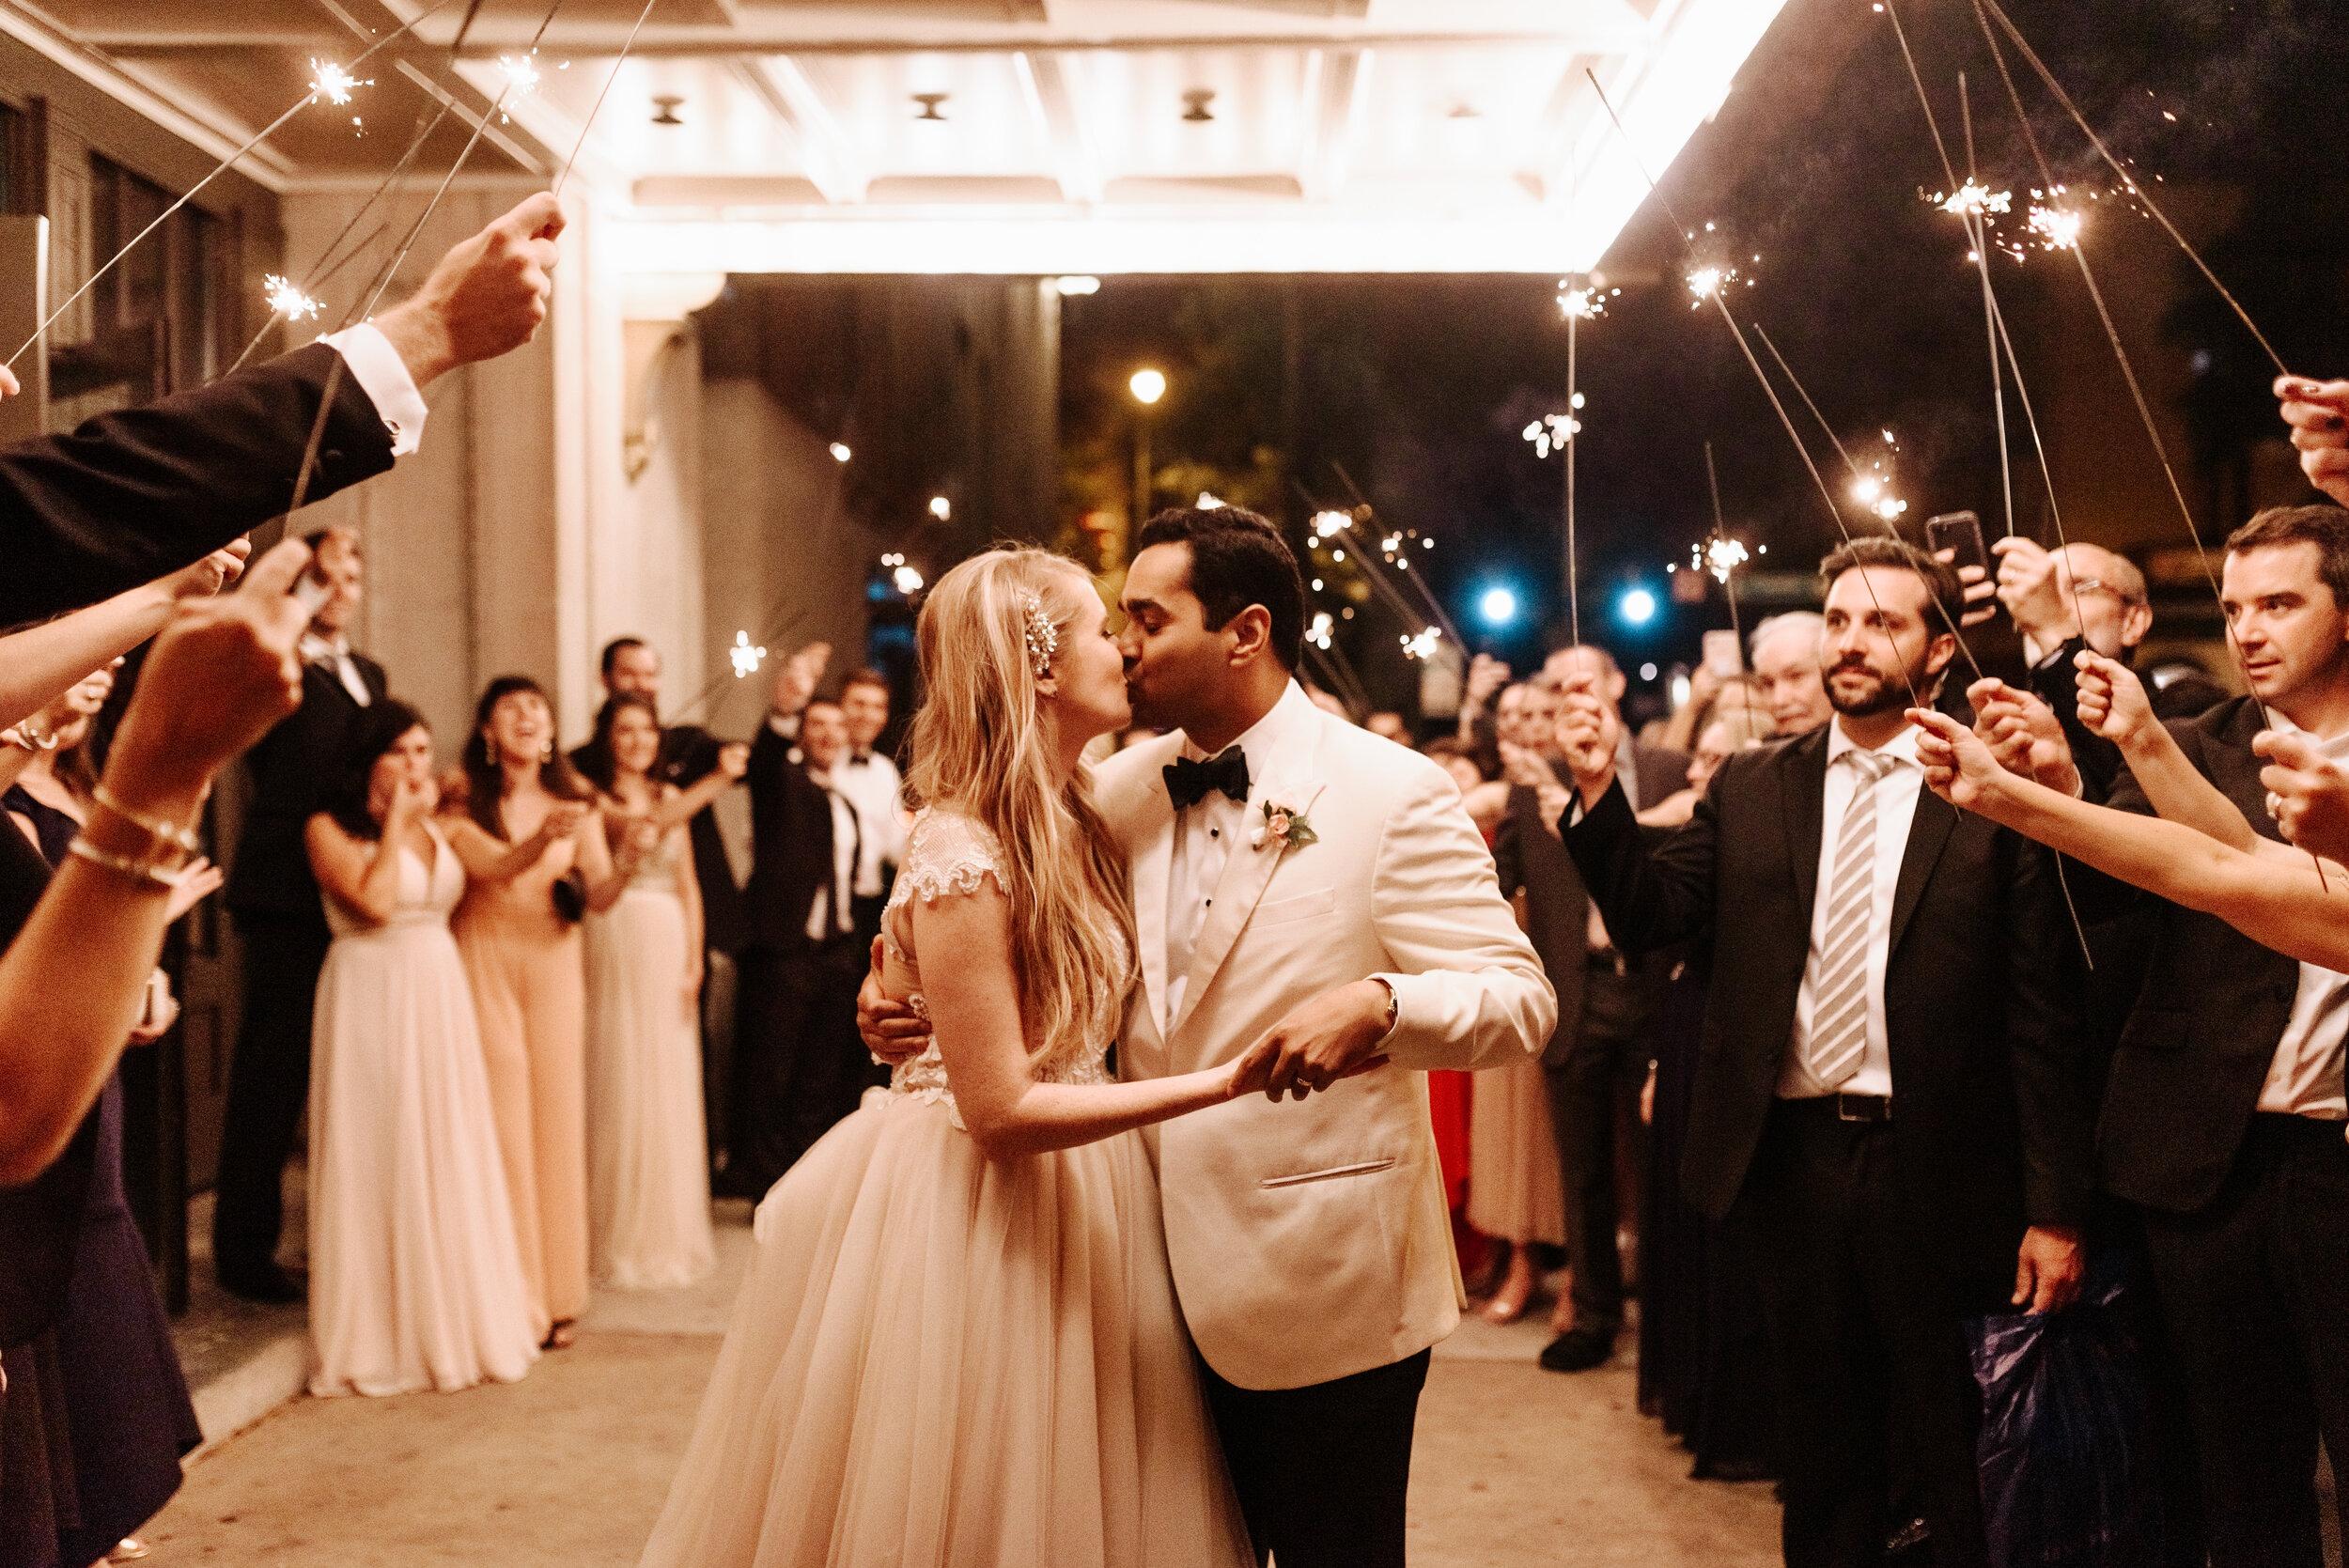 Cassie-Mrunal-Wedding-Quirk-Hotel-John-Marshall-Ballrooms-Richmond-Virginia-Photography-by-V-118.jpg